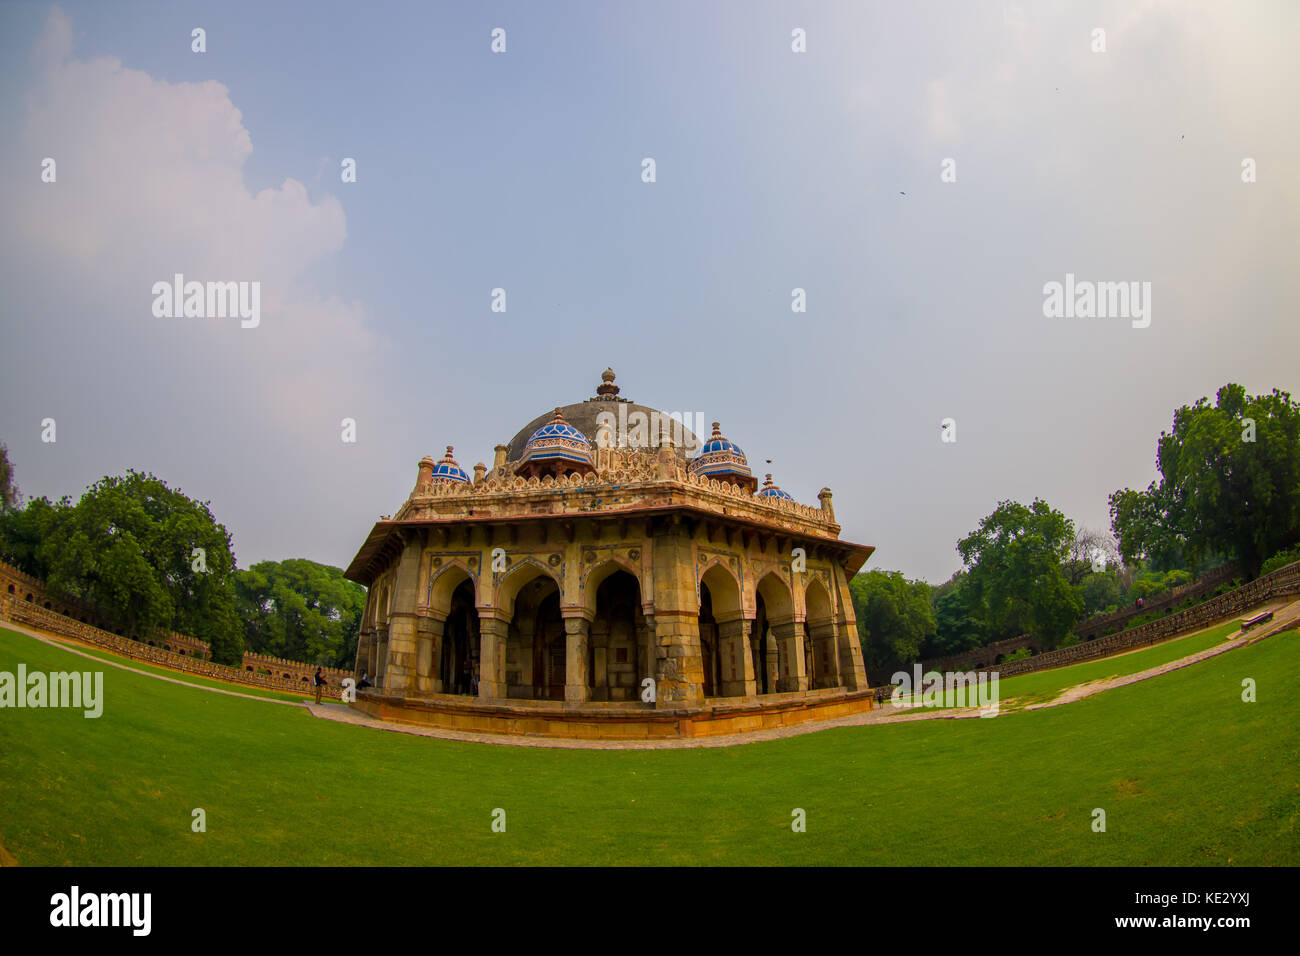 DELHI, INDIA - SEPTEMBER 19, 2017: Close up of a beautiful tomb of Isa Khan Niazi in humayum tomb complex, New Delhi, - Stock Image